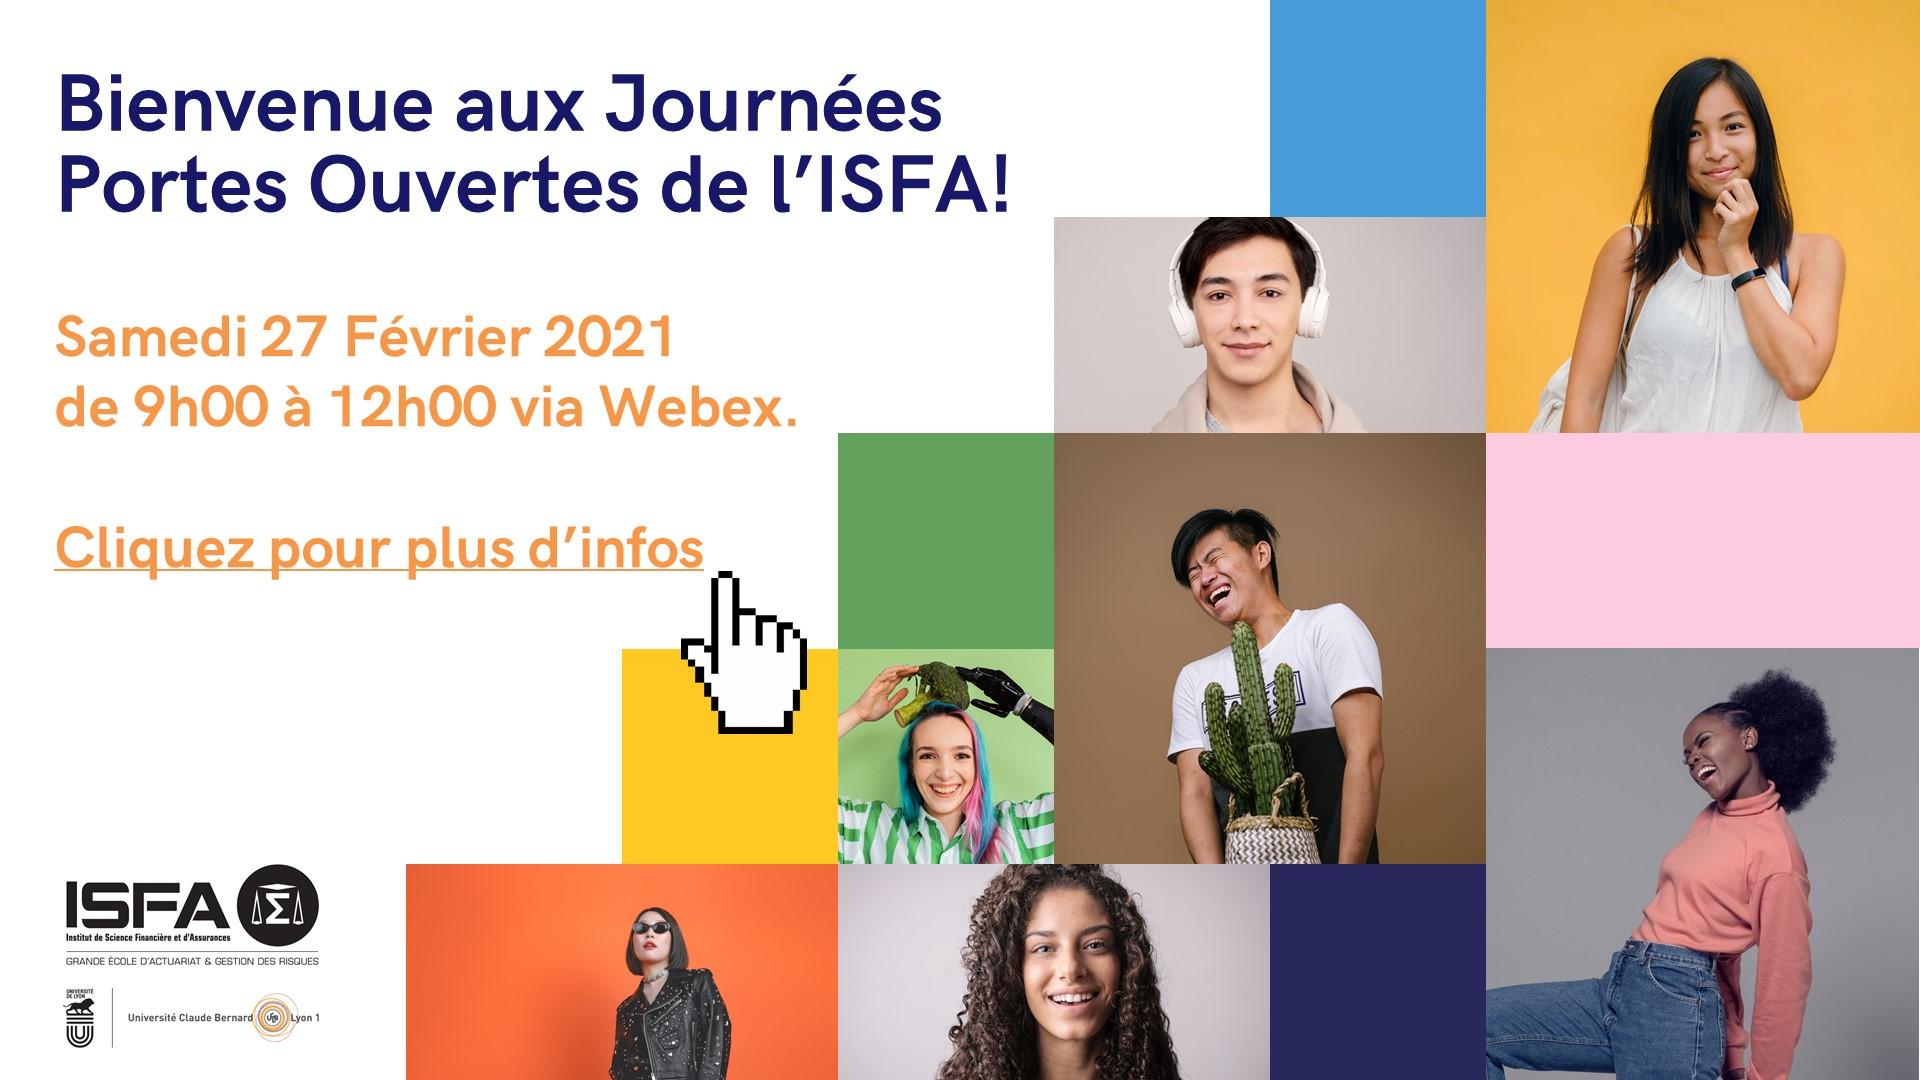 Bienvenue aux JPO ISFA 2021